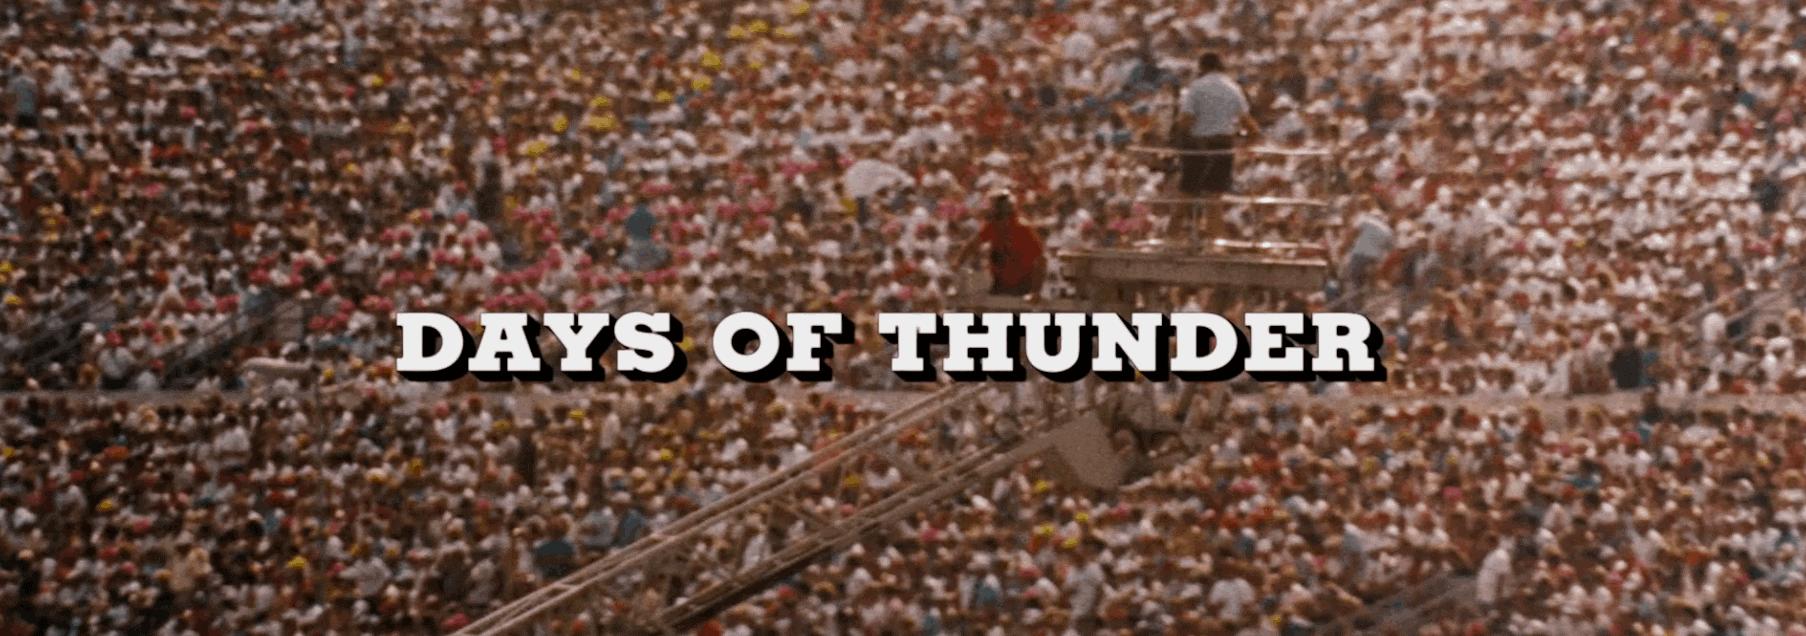 Days of Thunder 4K Ultra HD logo